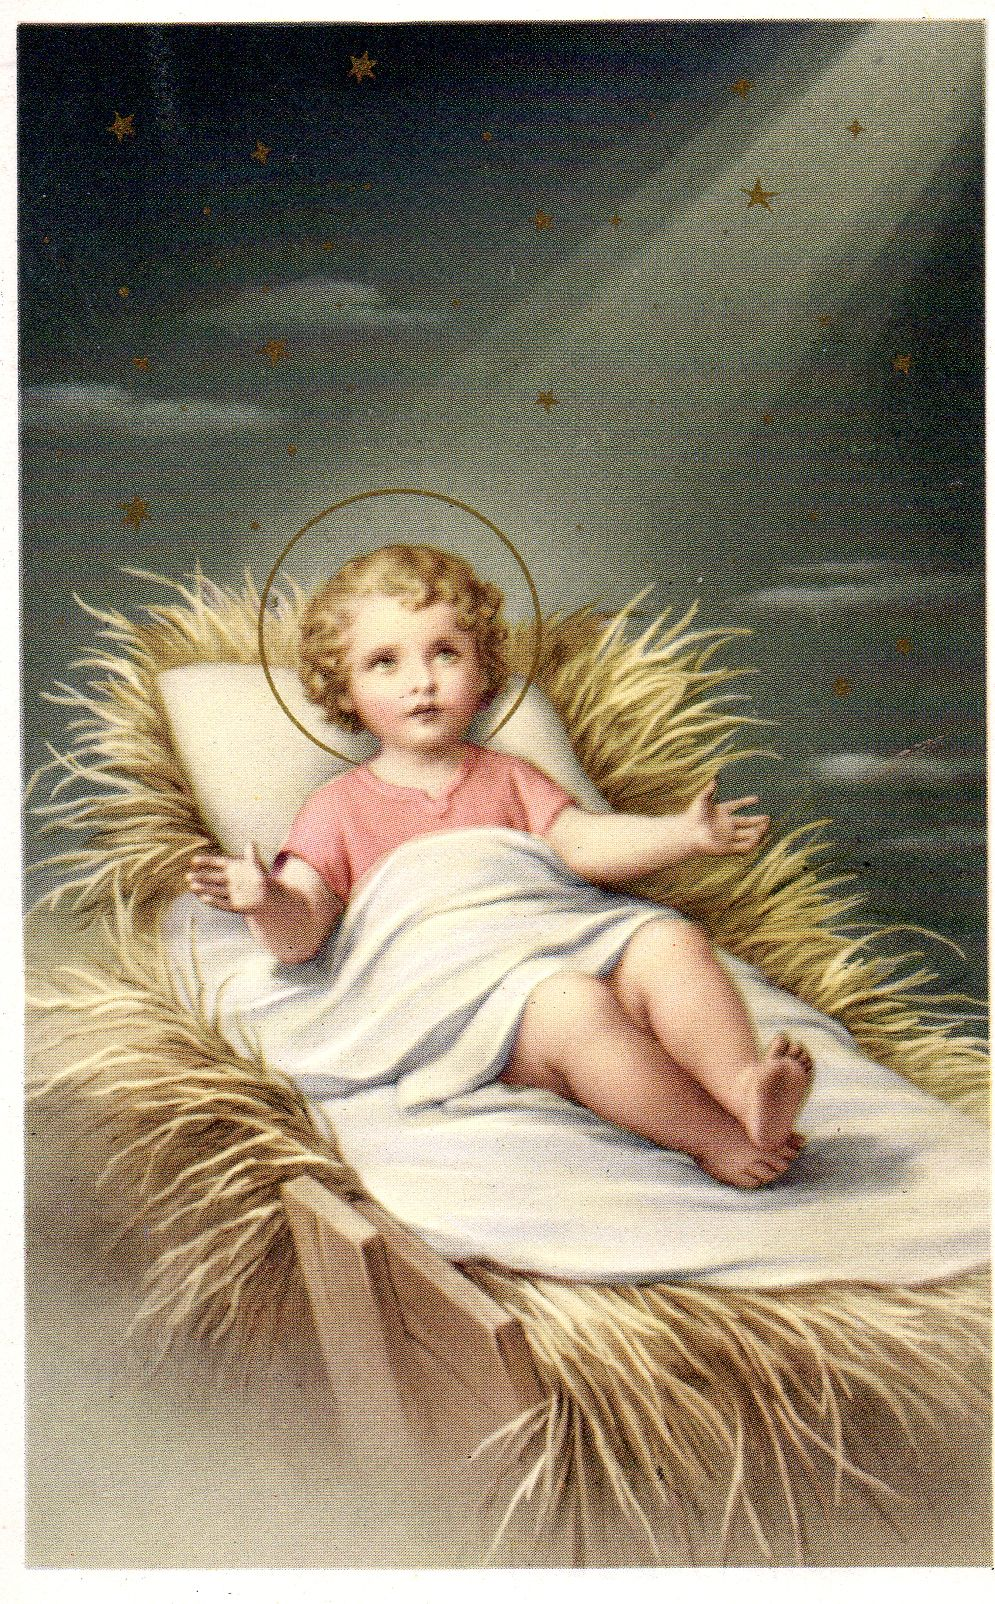 Y le encontrarás recostado en un pesebre... | Imagens religiosas, Santissima trindade, Imagem nossa senhora aparecida